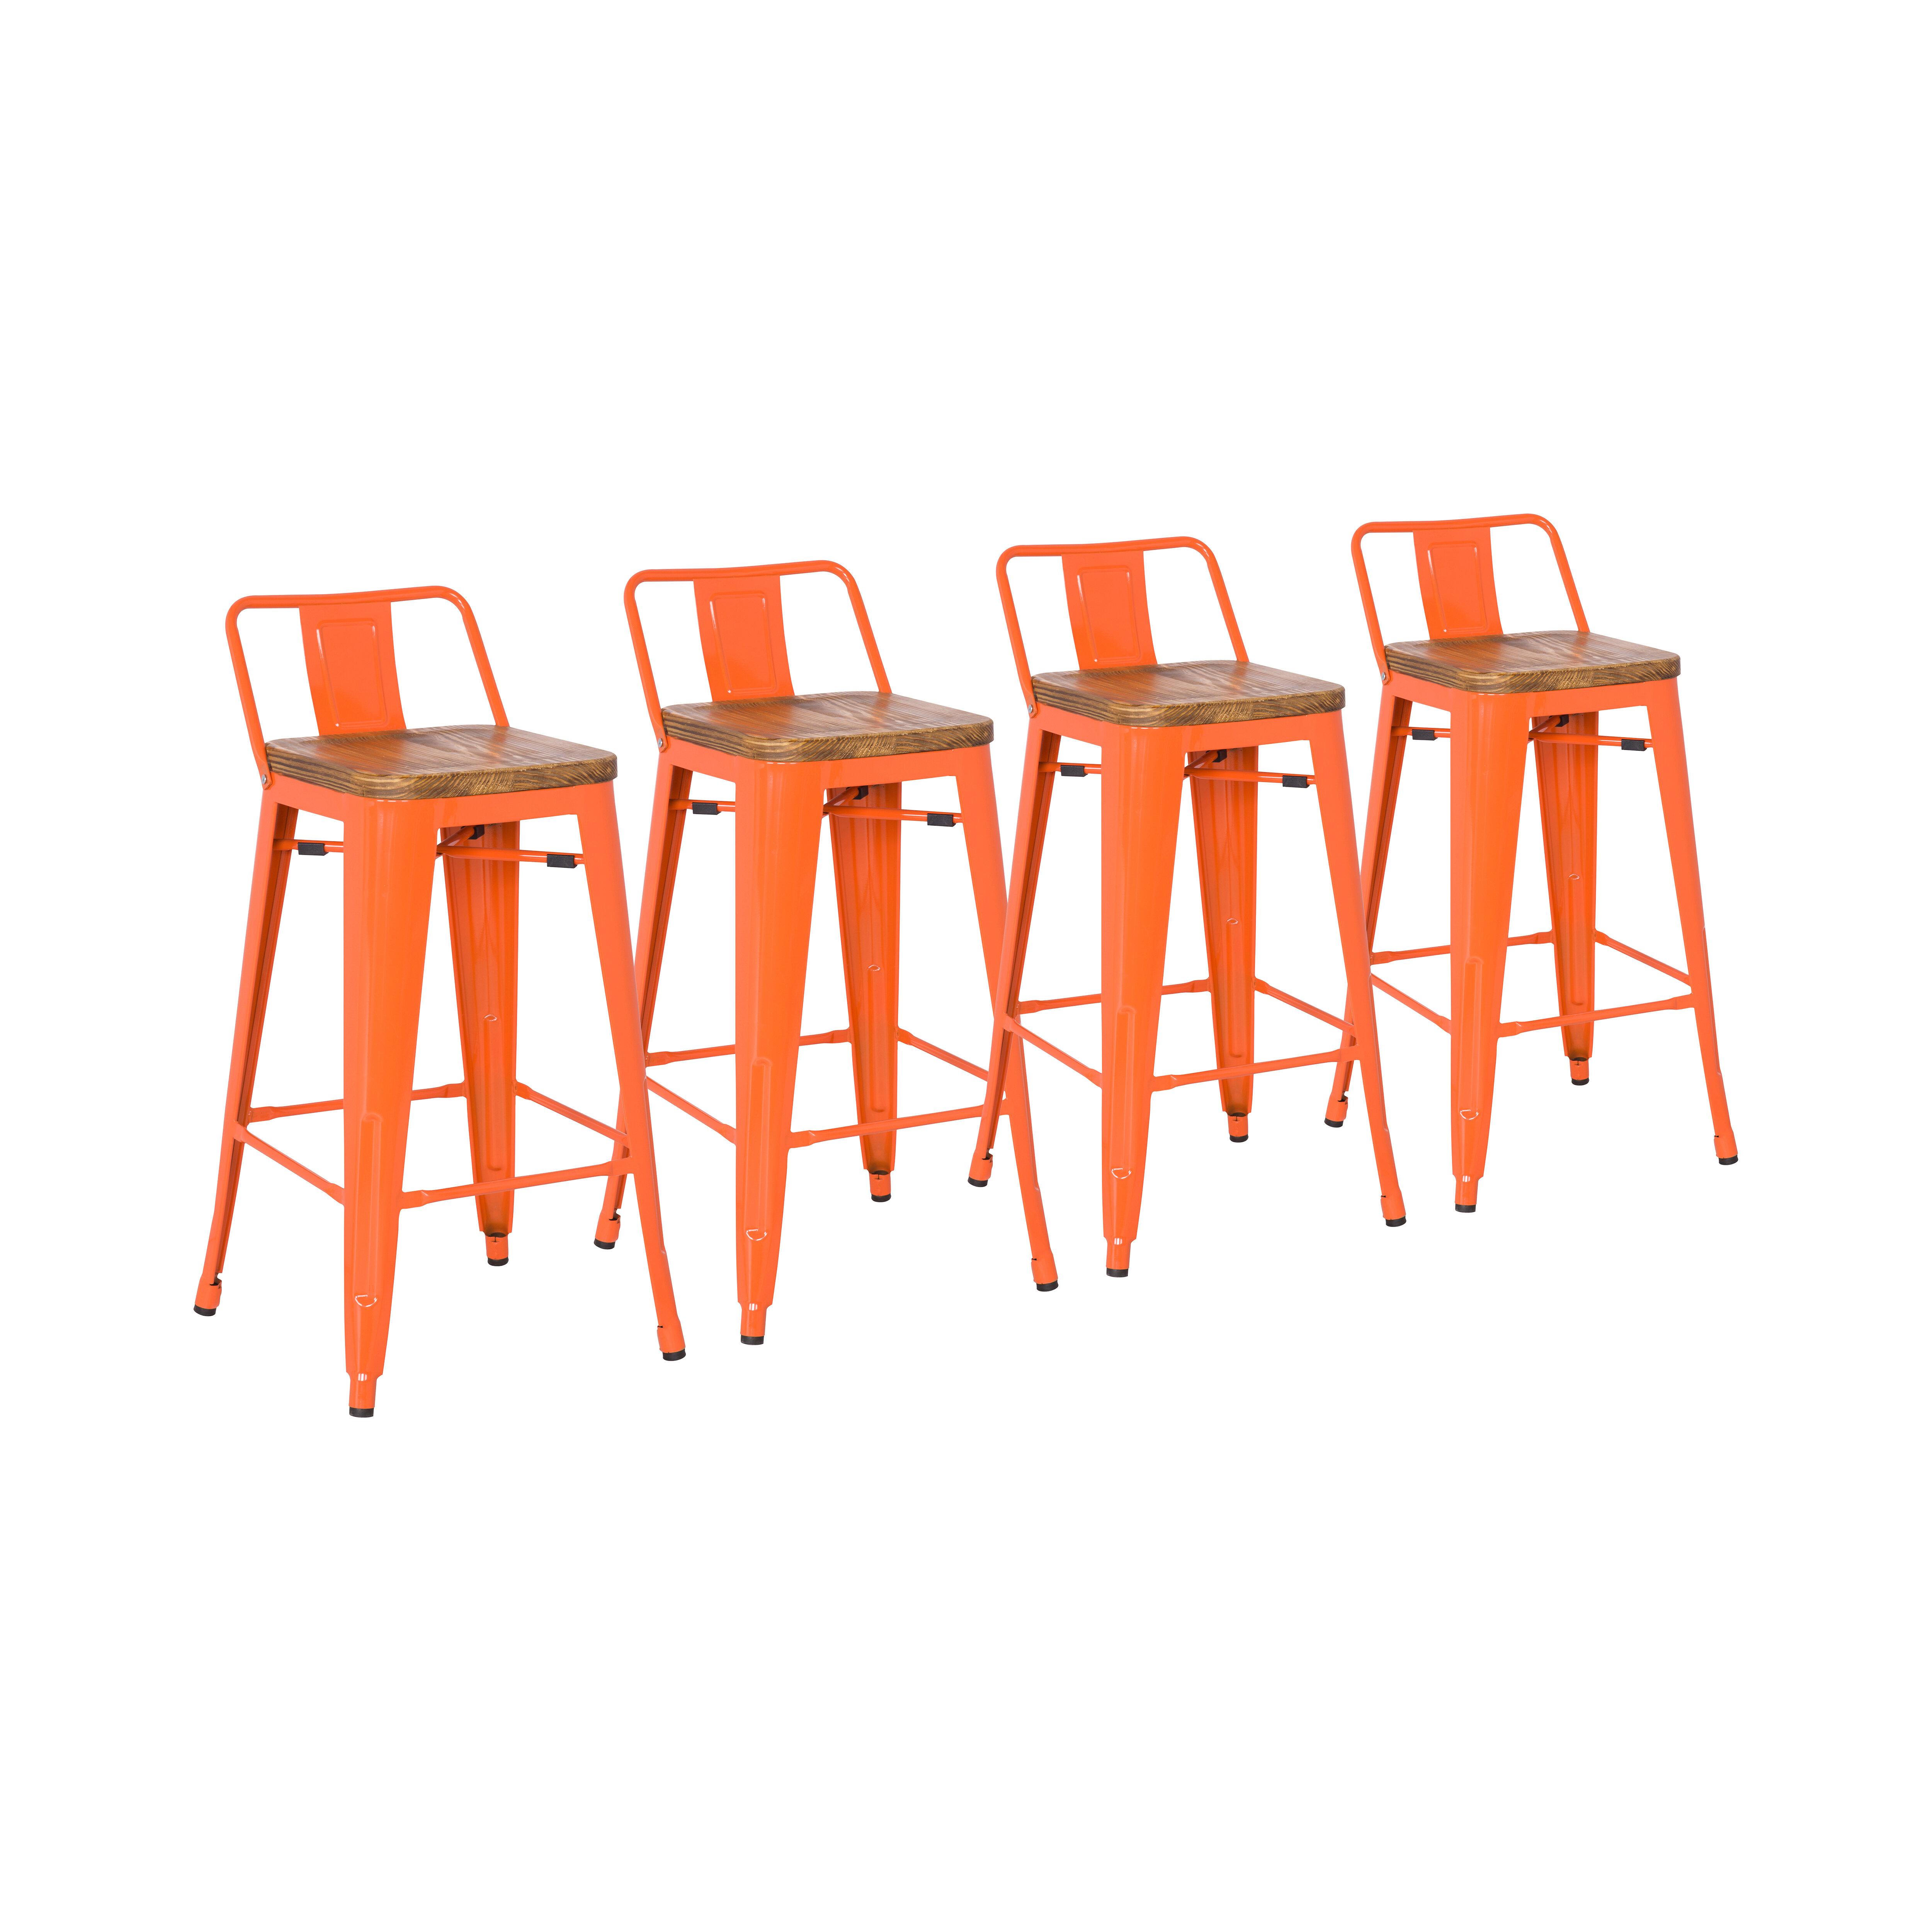 Groovy Shumake 26 Bar Stool Inzonedesignstudio Interior Chair Design Inzonedesignstudiocom